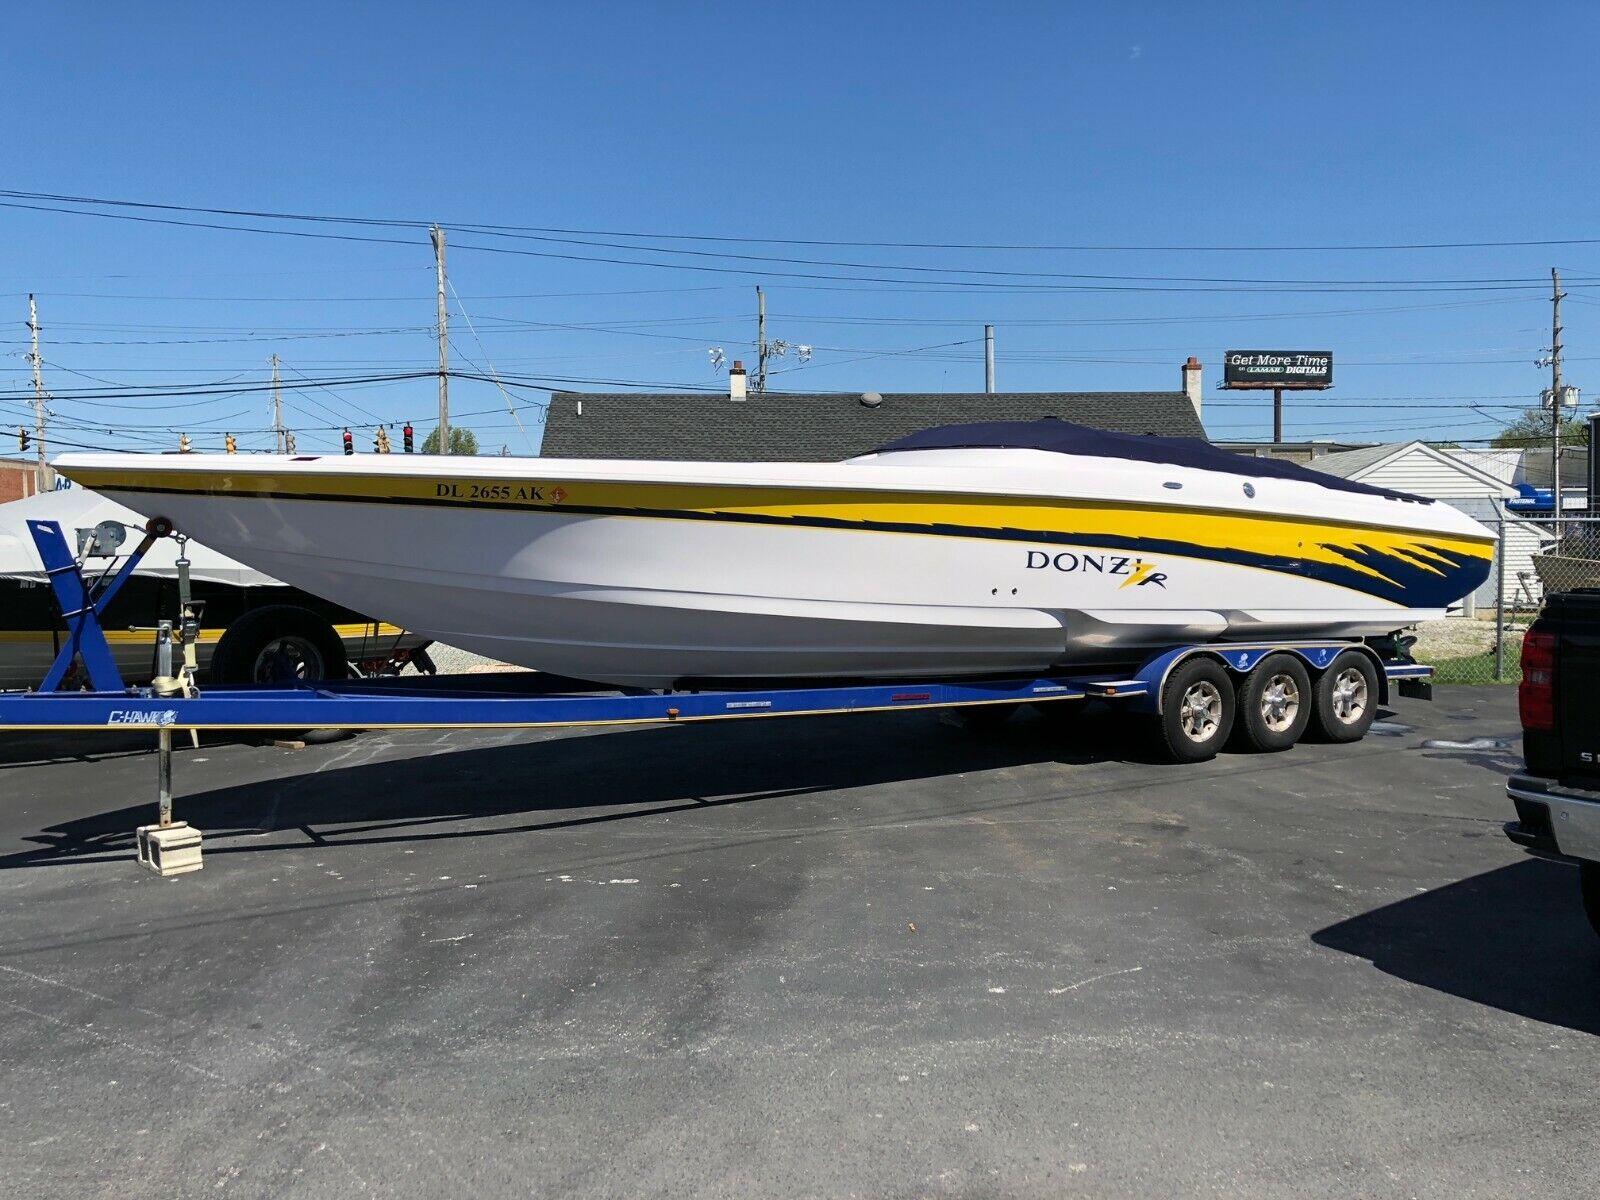 2005 Donzi 35Zr High Performance Boat Cigarette Baja Fountain Formula